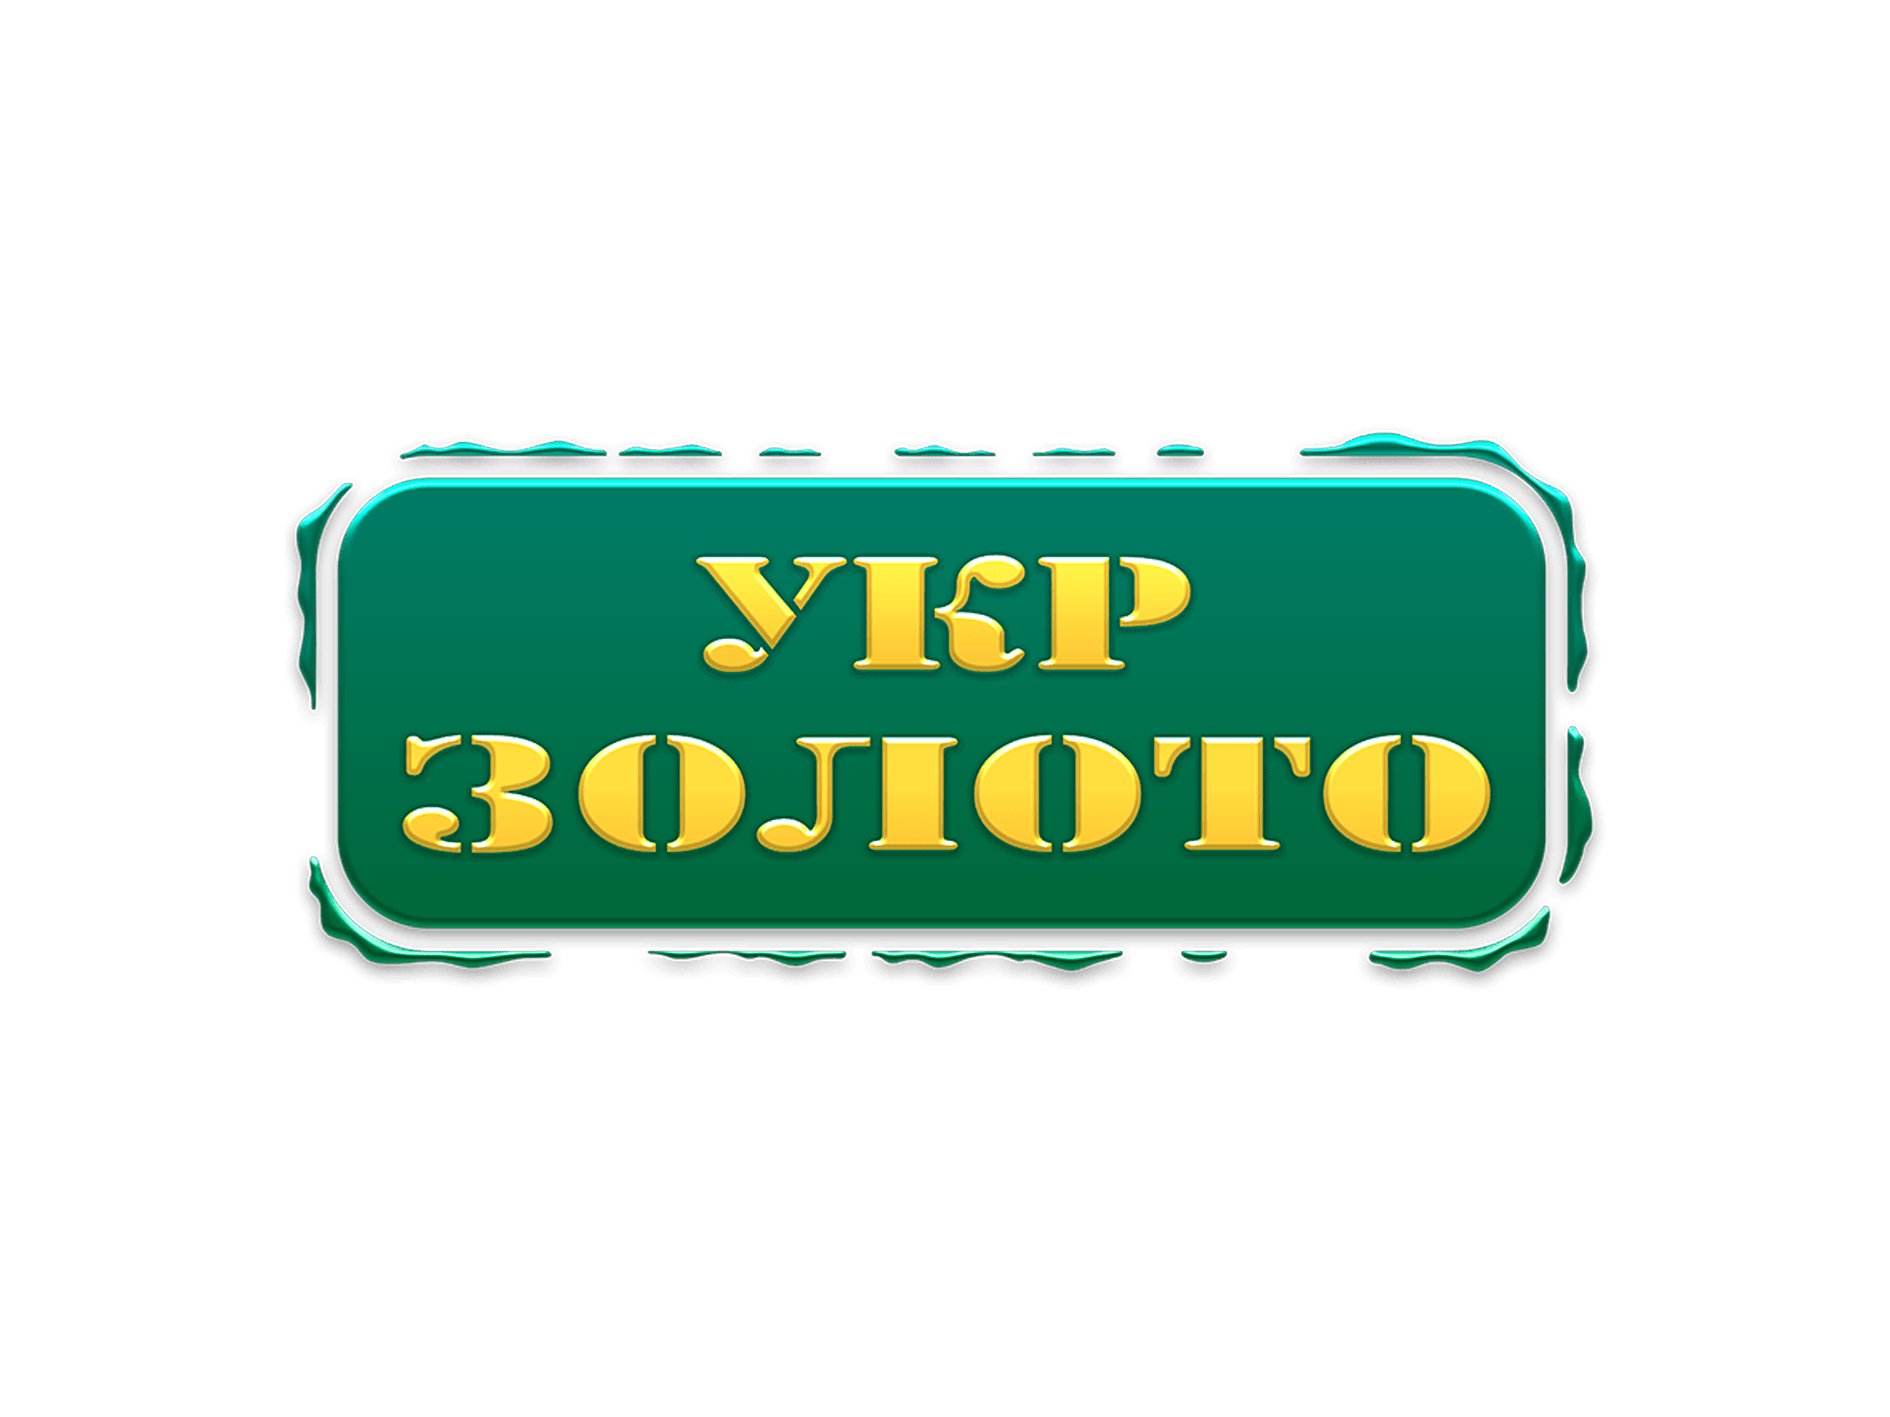 Укрзолото - kiev.karavan.com.ua